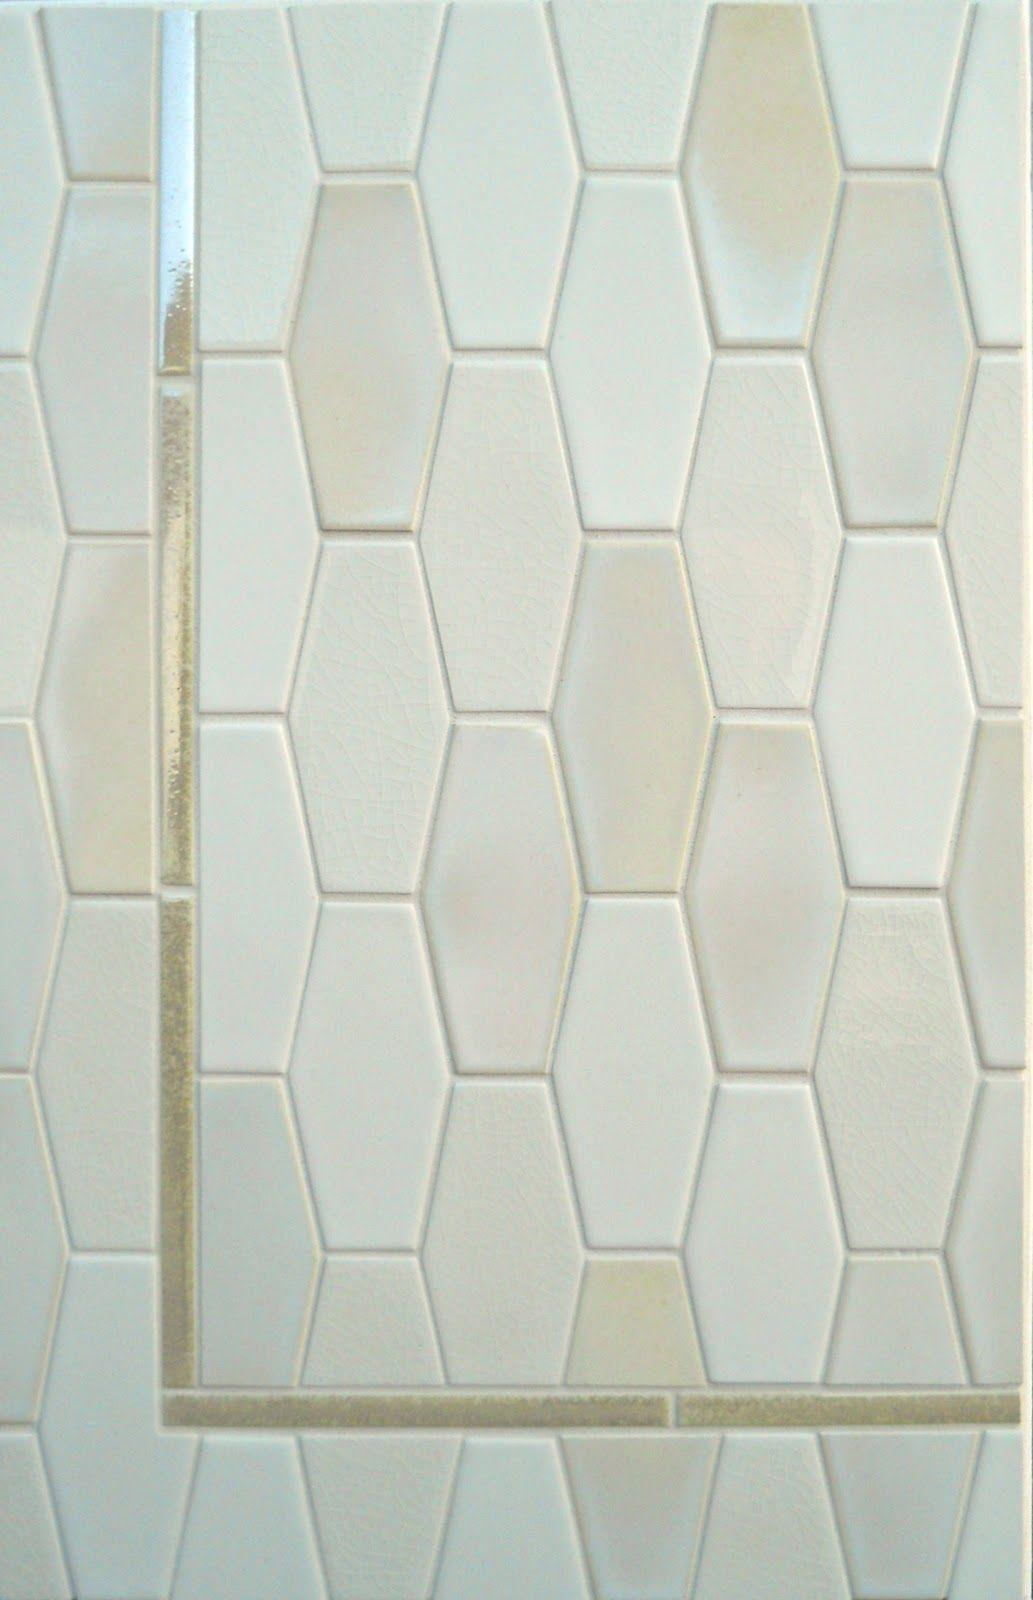 Natural Hues 3x6x8 El Hex Daltile Elongated Hexagon Tile White